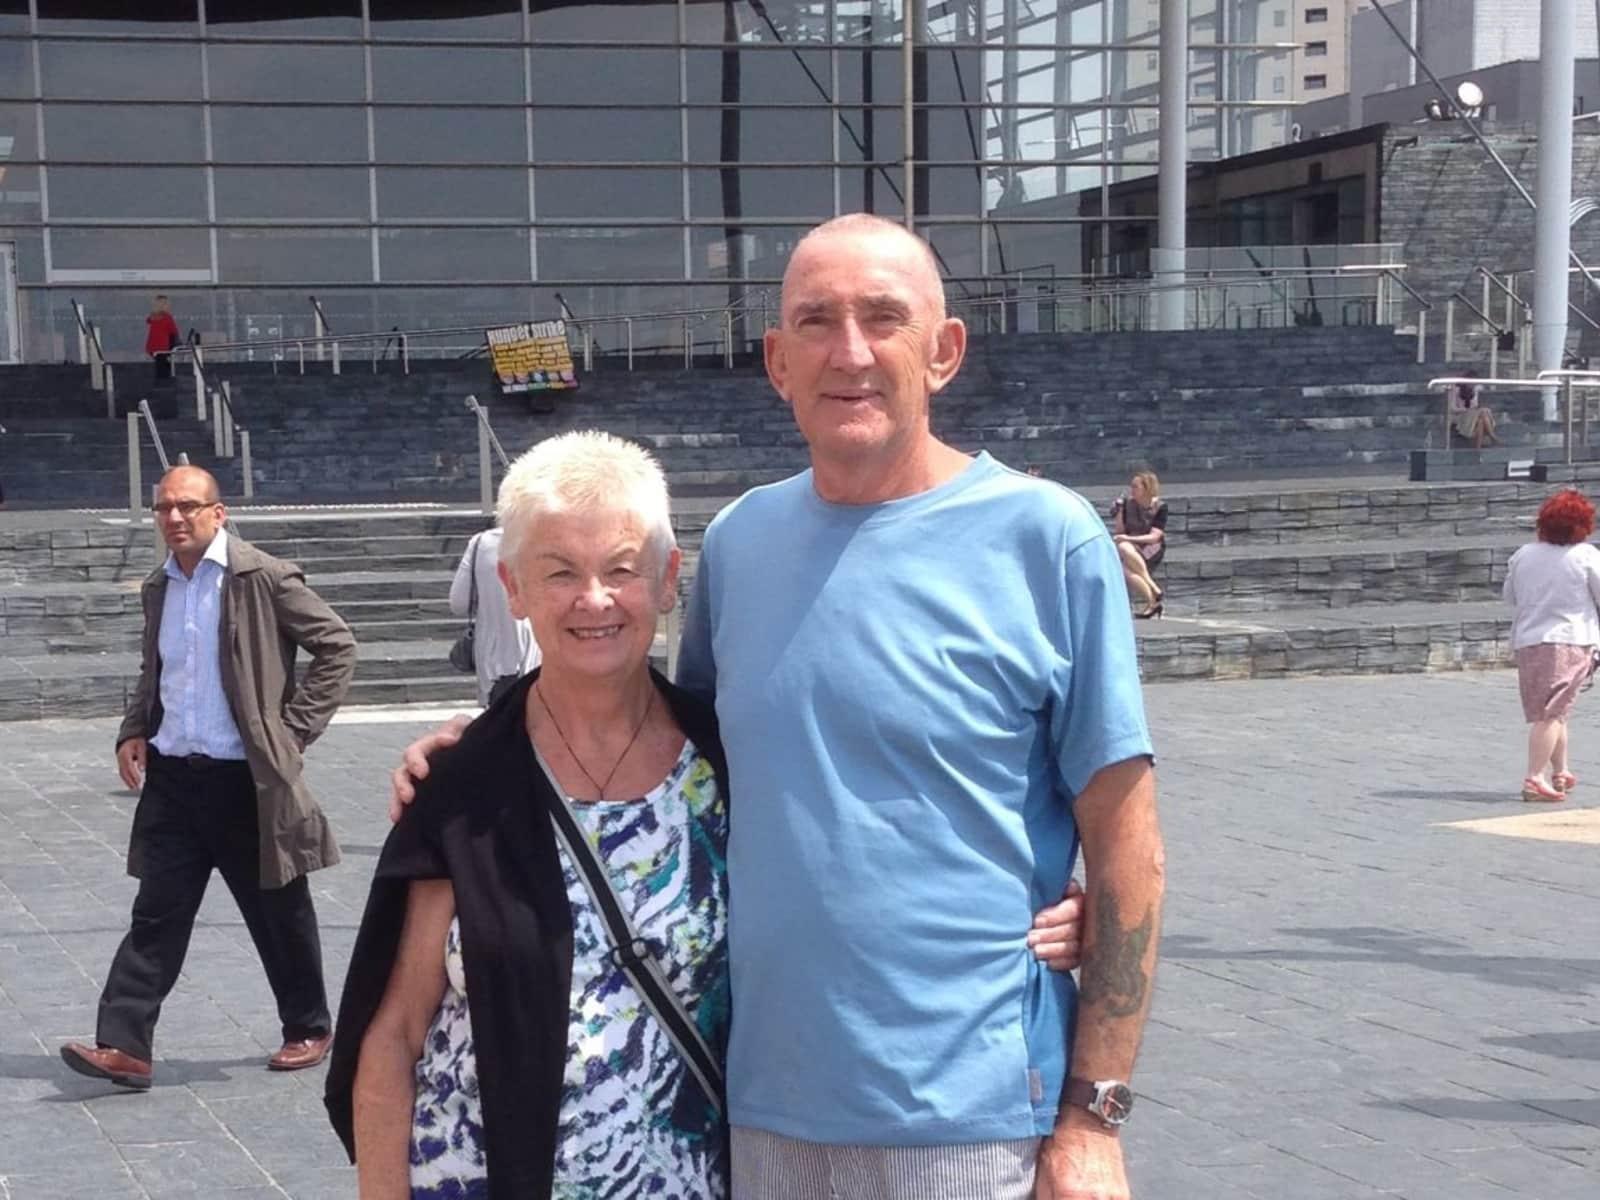 Gillian & Peter john from Palmerston North, New Zealand